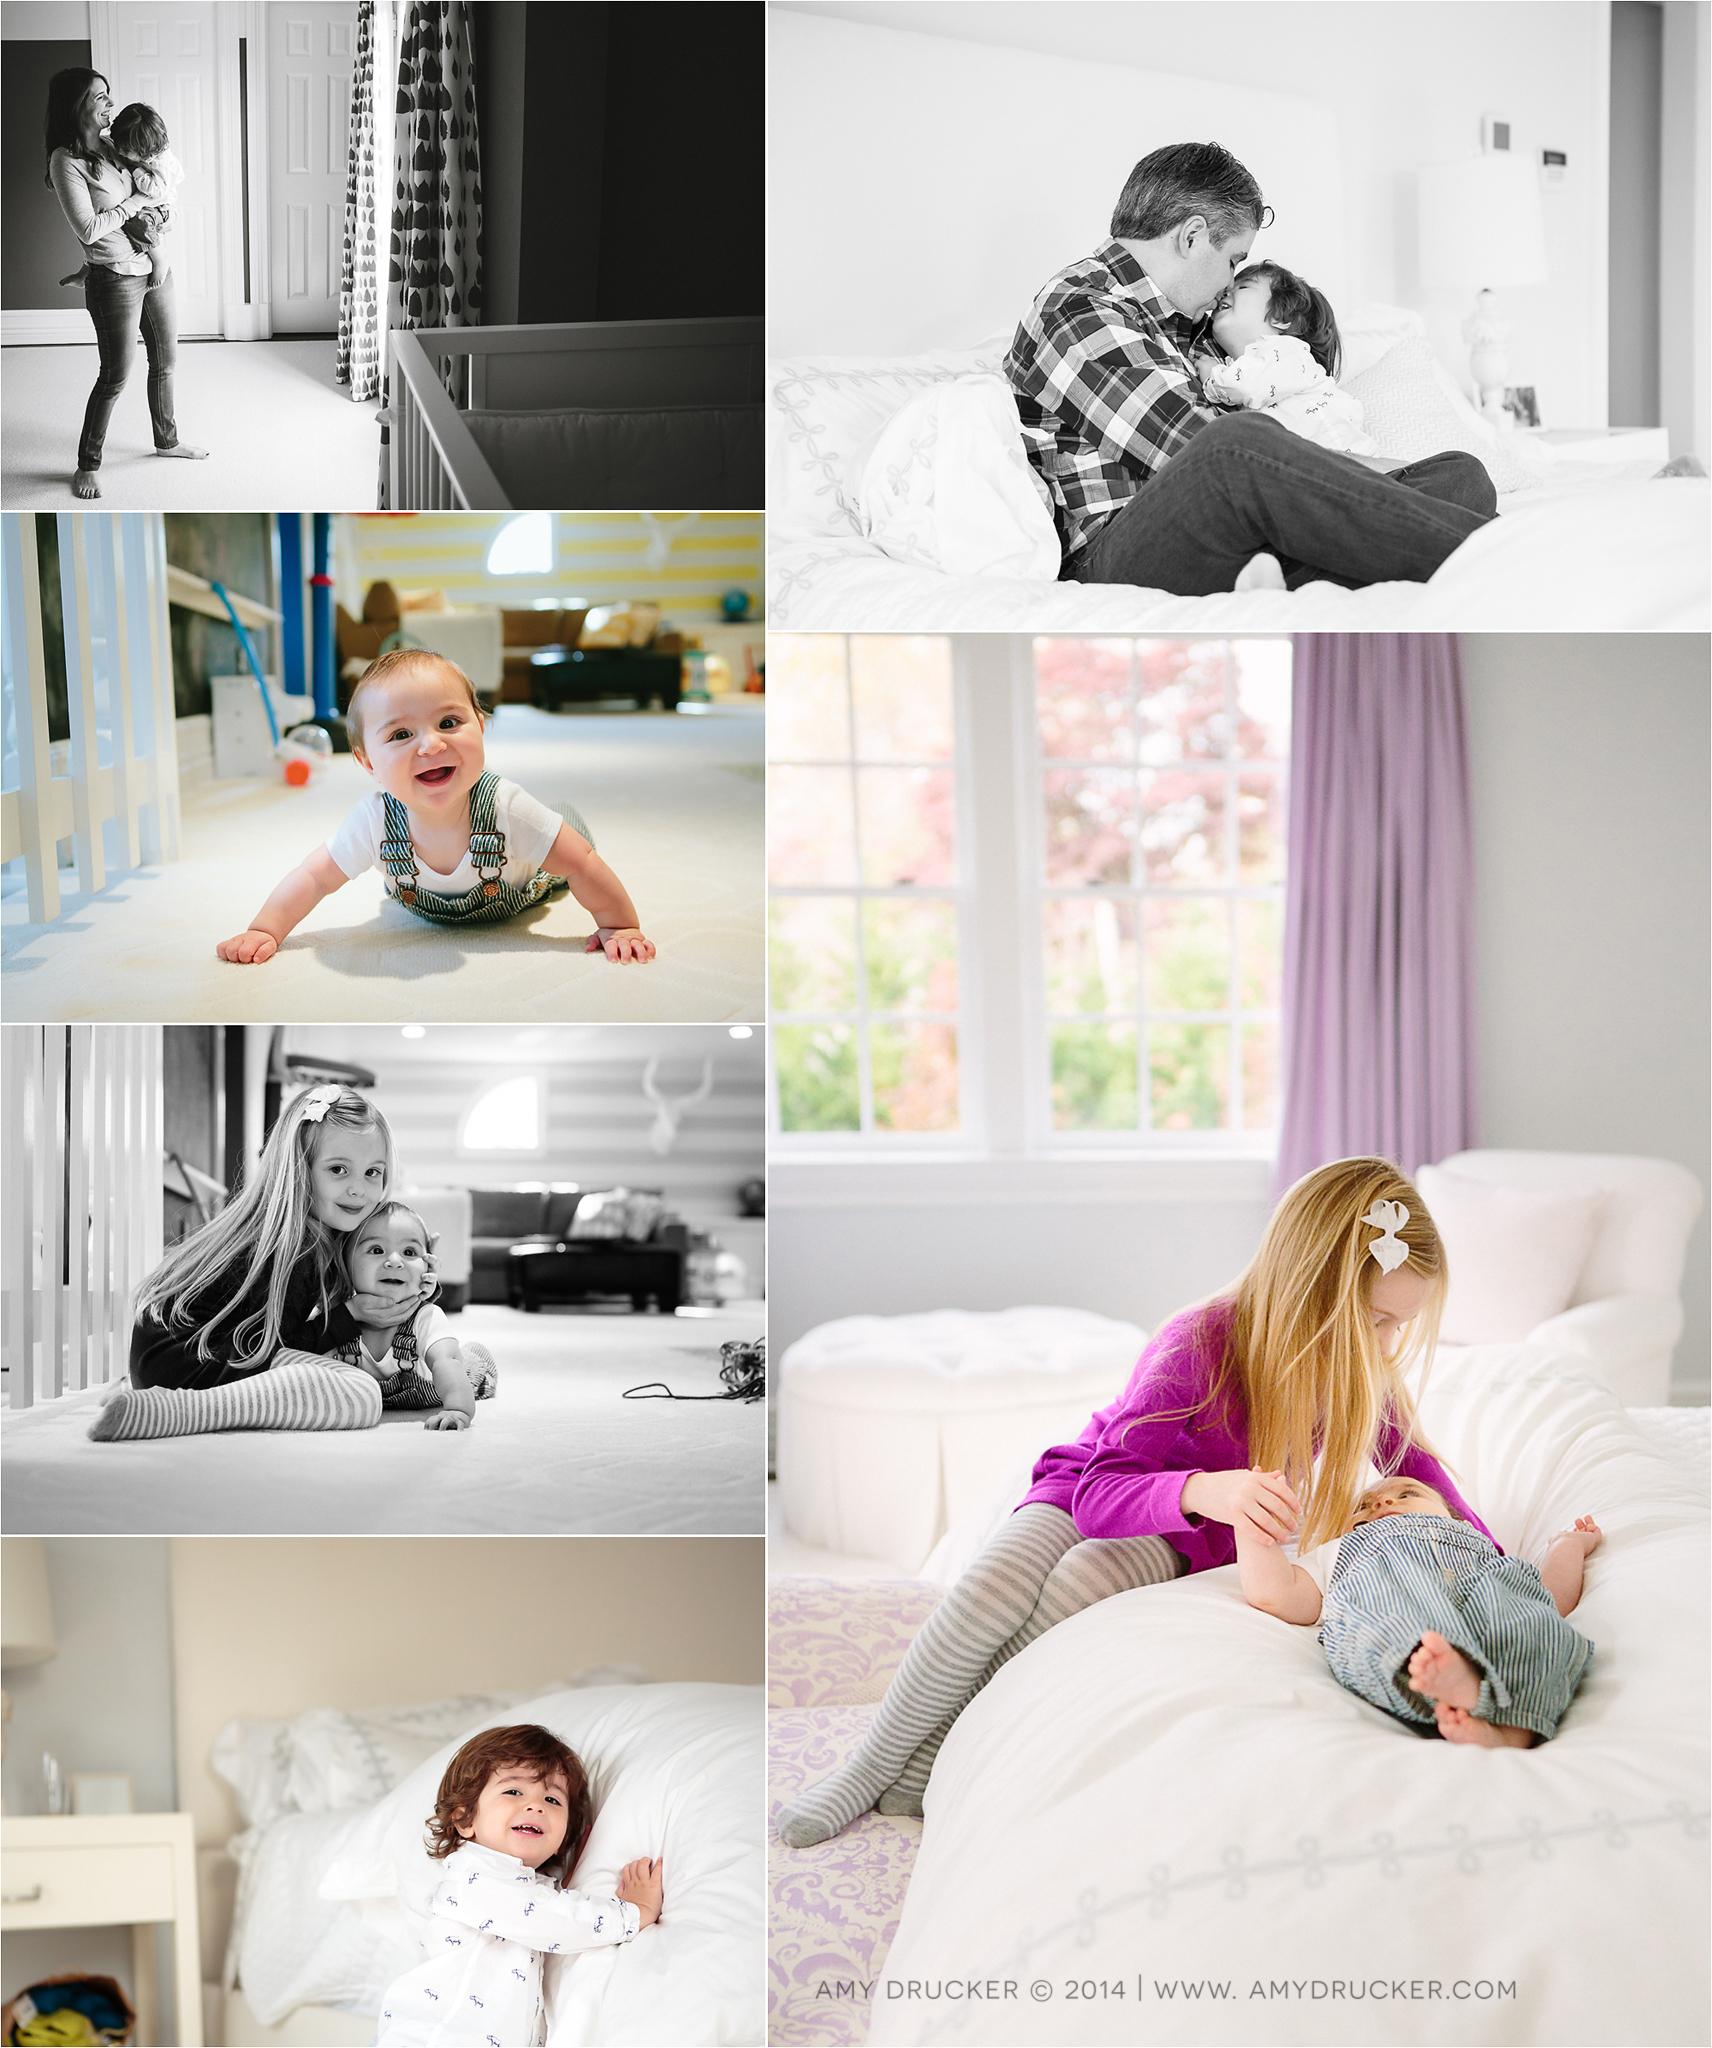 Amy_Drucker_New_York_Lifestyle_Photography5